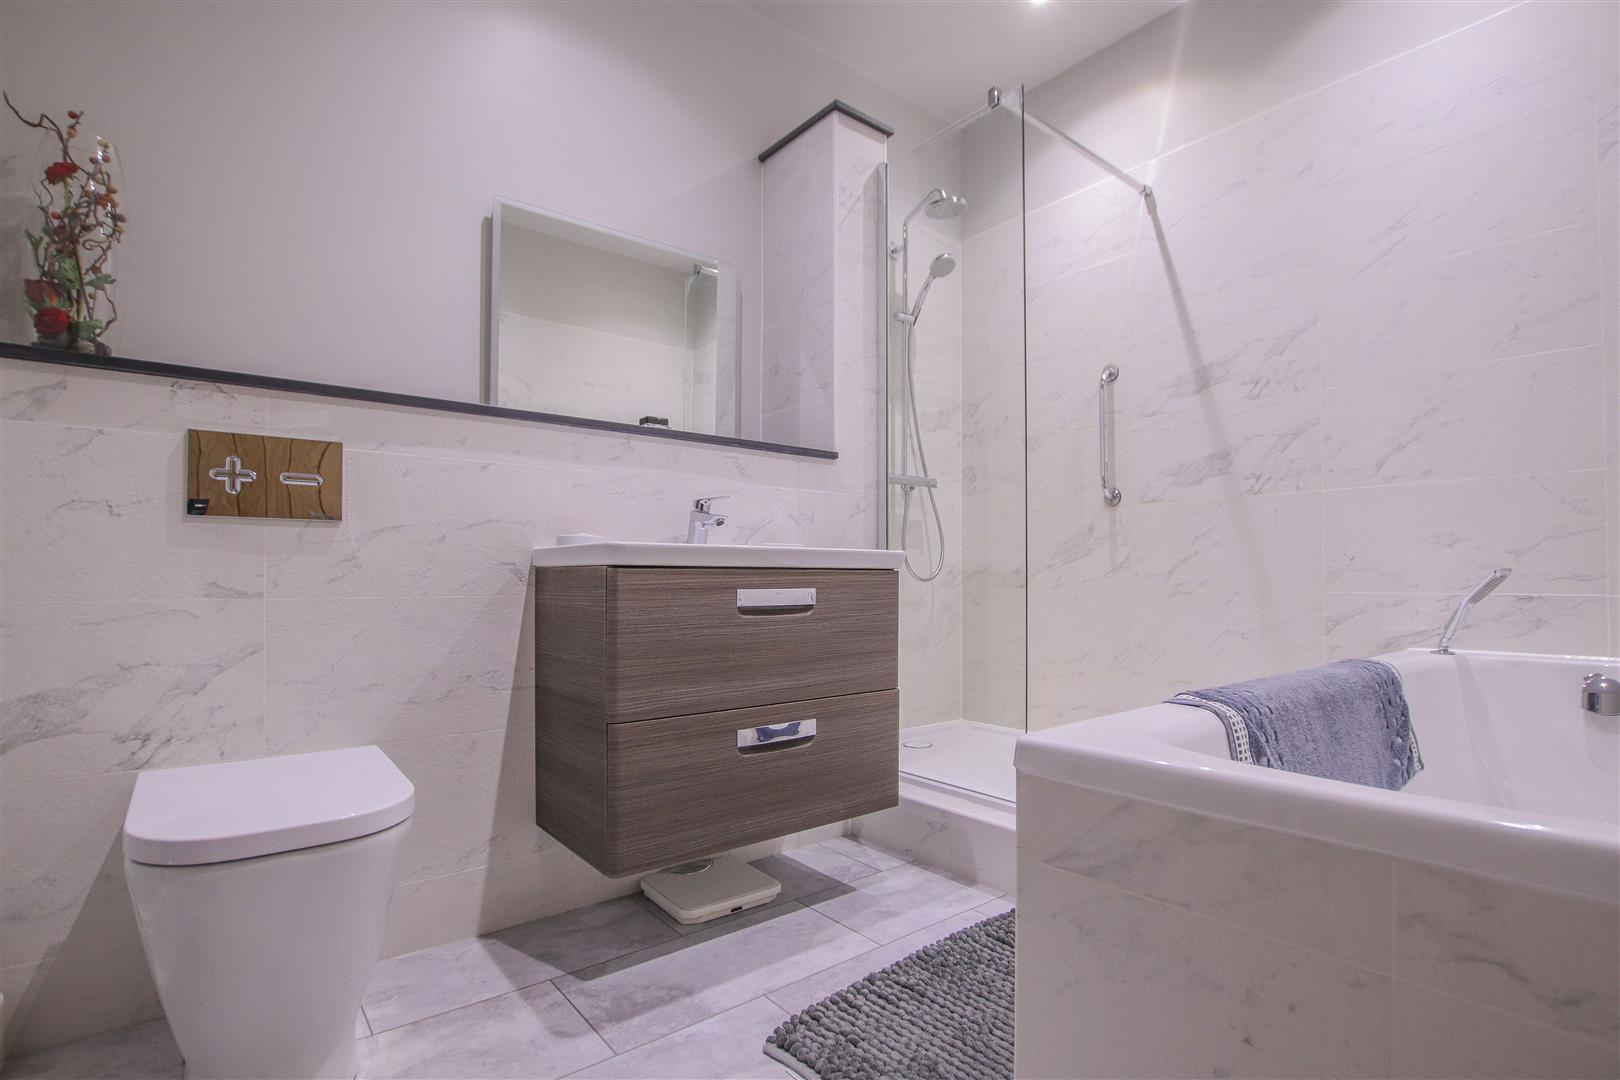 6 Bedroom Barn Conversion For Sale - 26.JPG